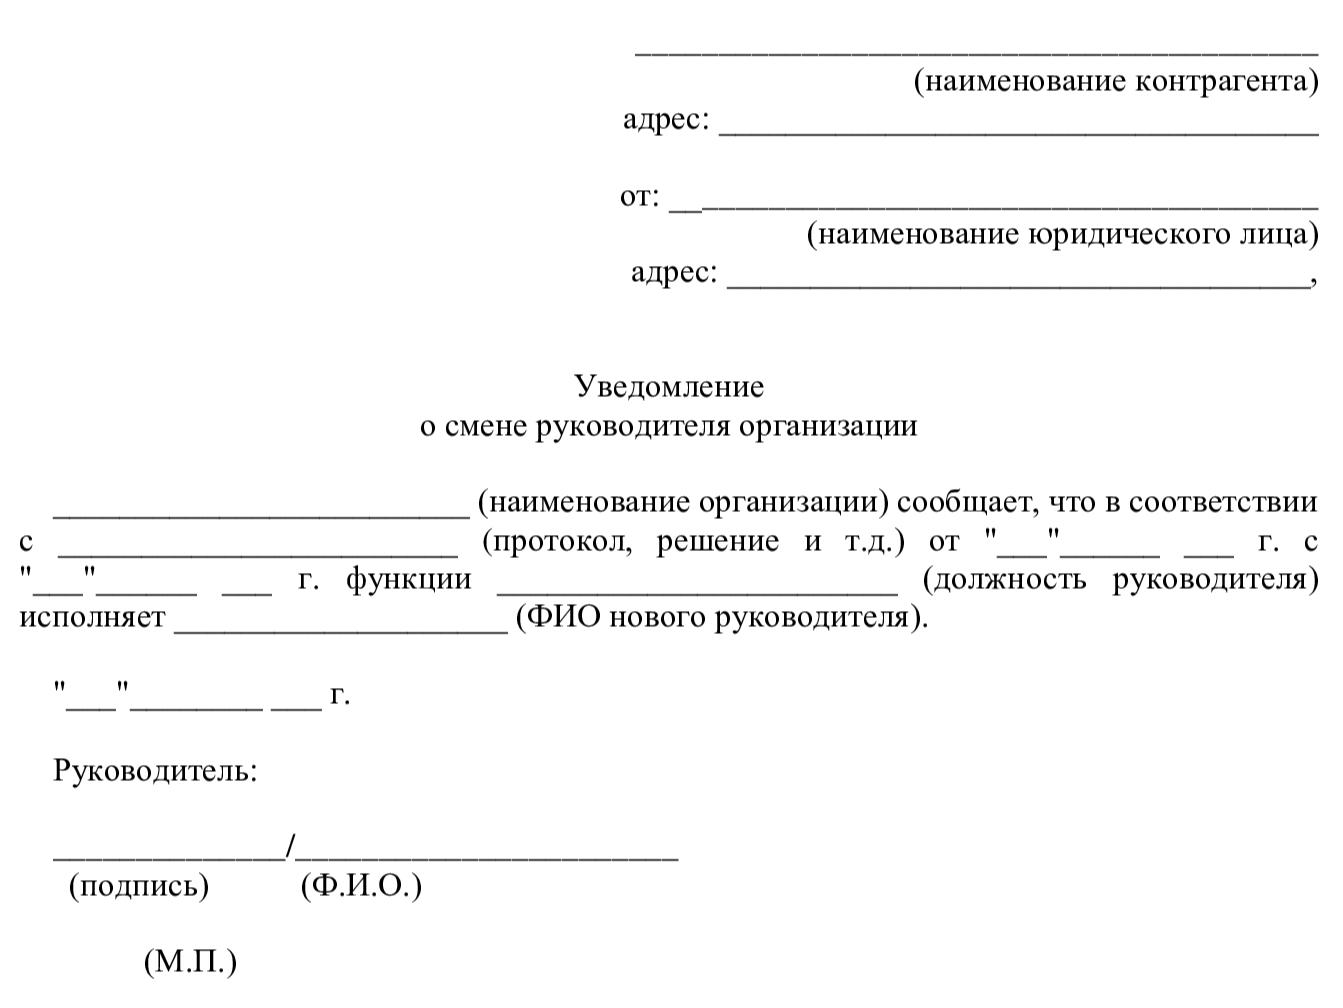 /fls/98450/obrazets-informatsionnogo-pisma-o-smene-direktora-blank.png